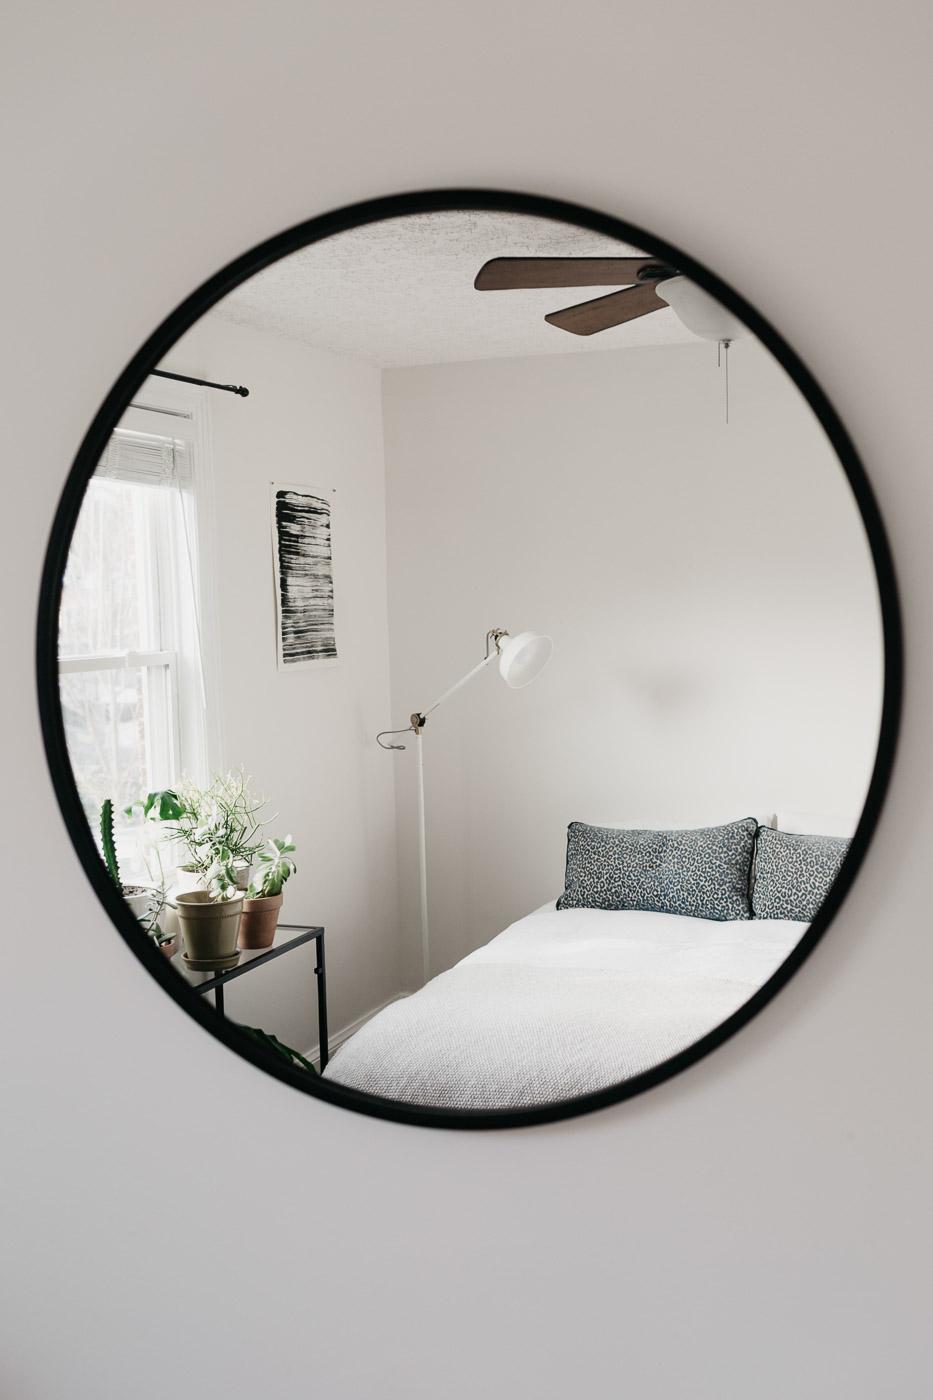 cozy-casa-nashville-tn-natural-light-studio-photography-ideas-lifestyle-photographer-photography-10.jpg